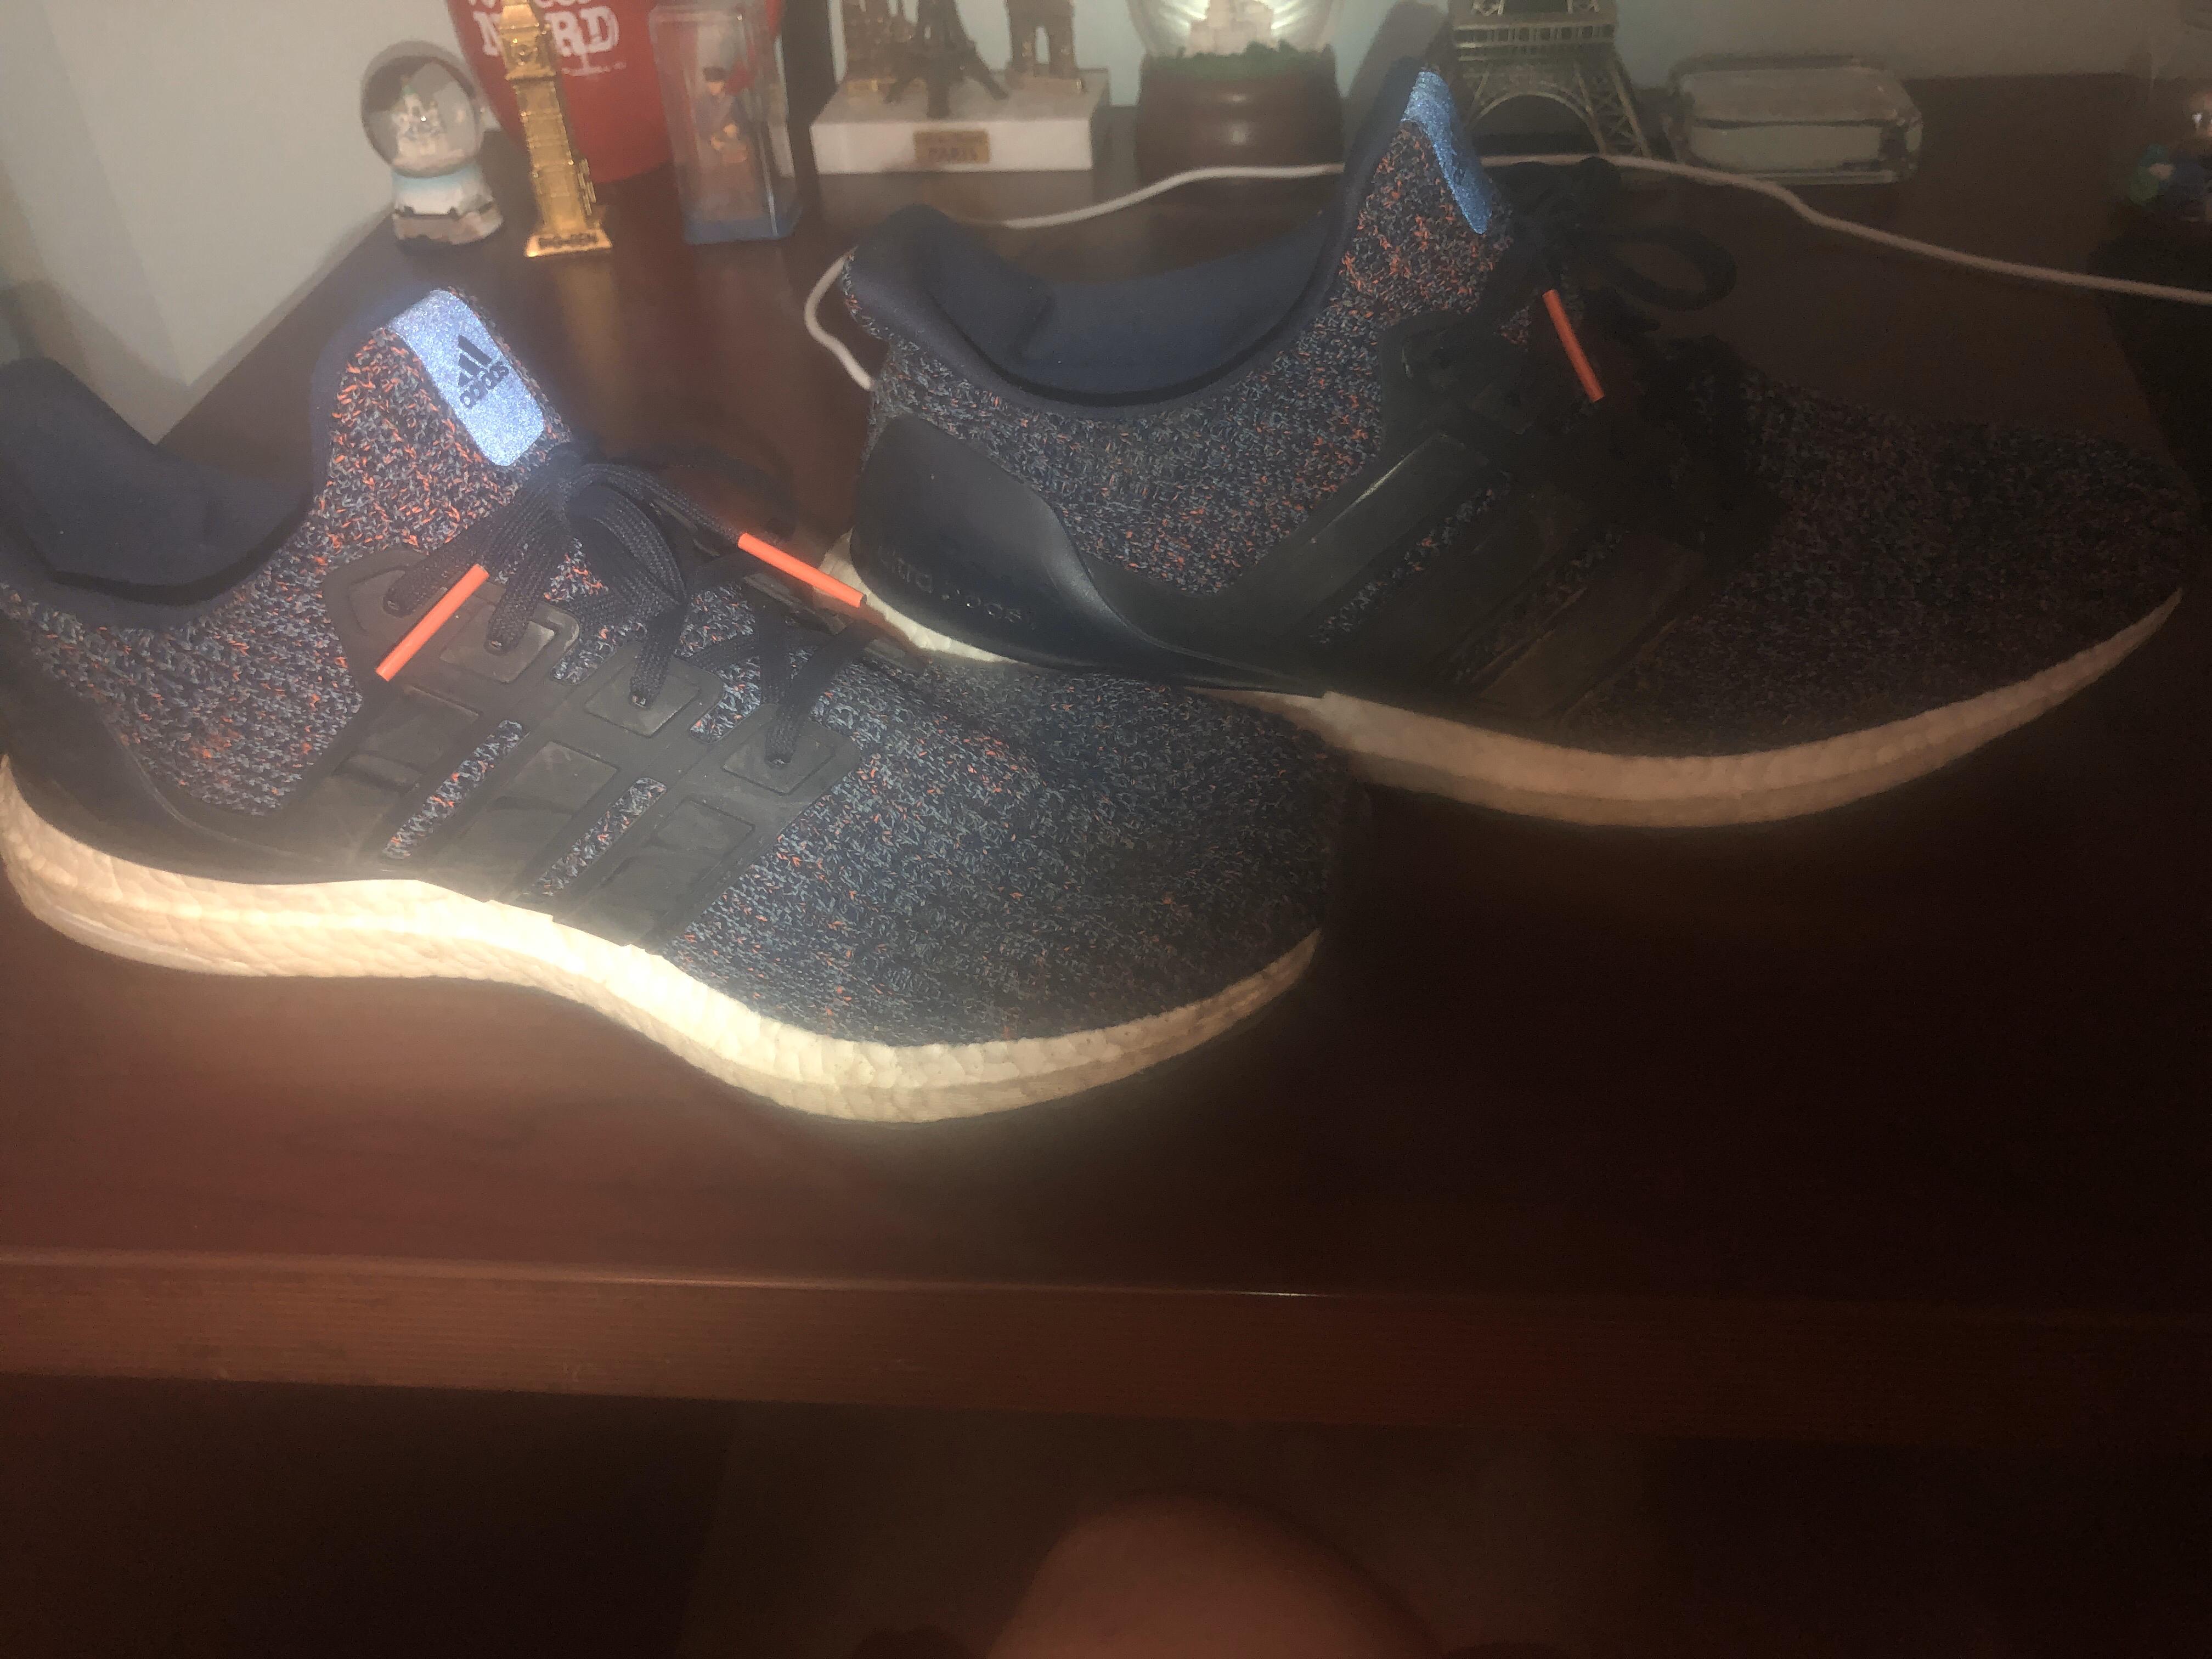 Adidas - $80 - Size 10.5